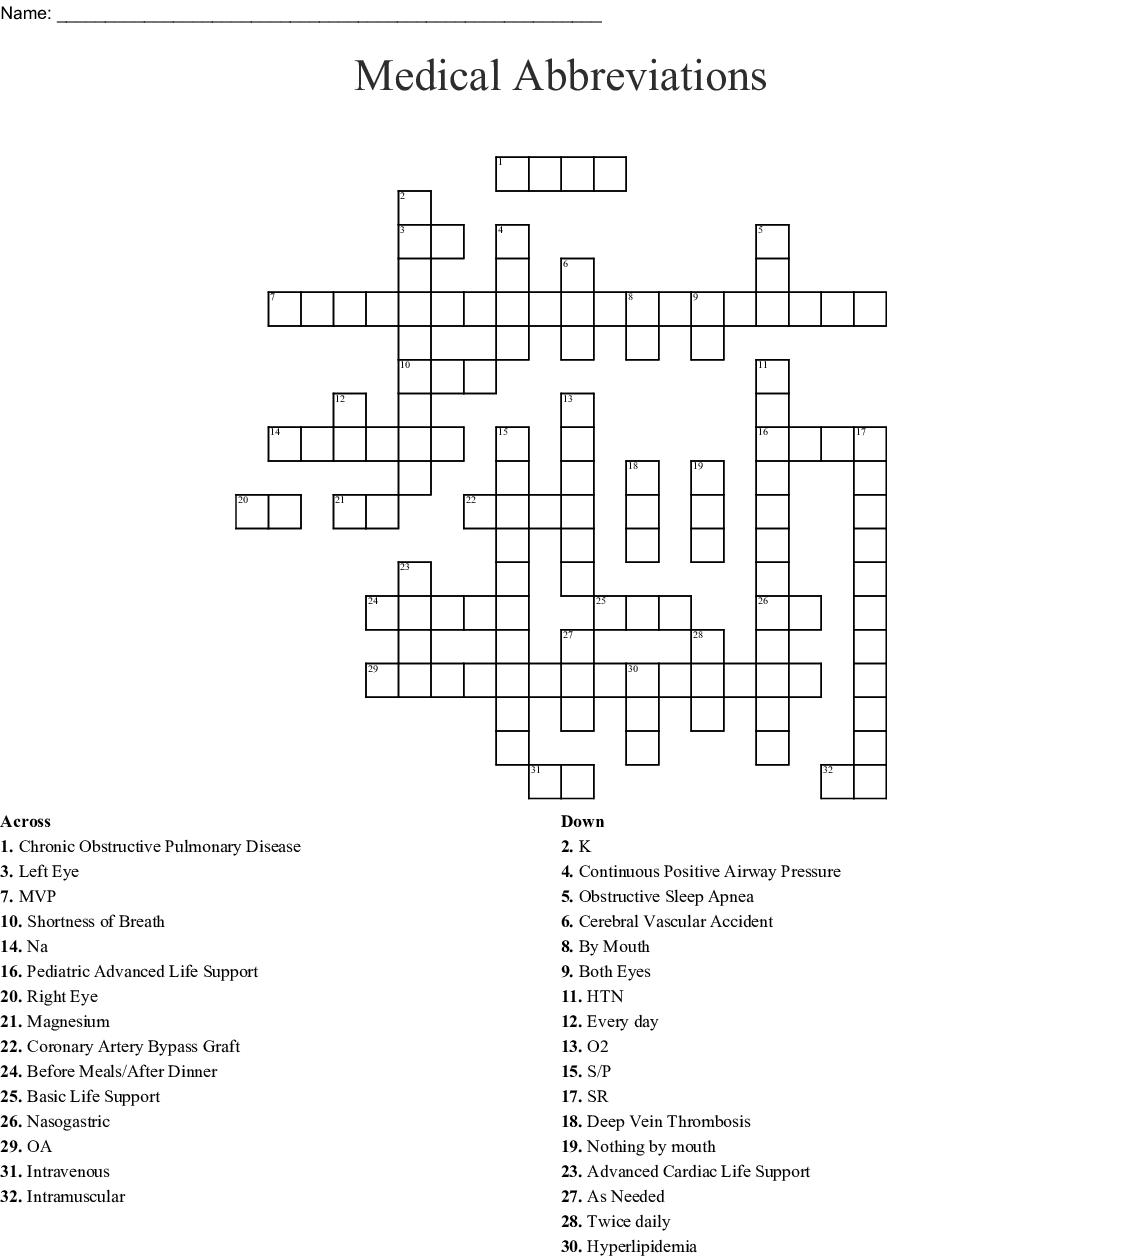 Using Medical Abbreviations Worksheet Answers